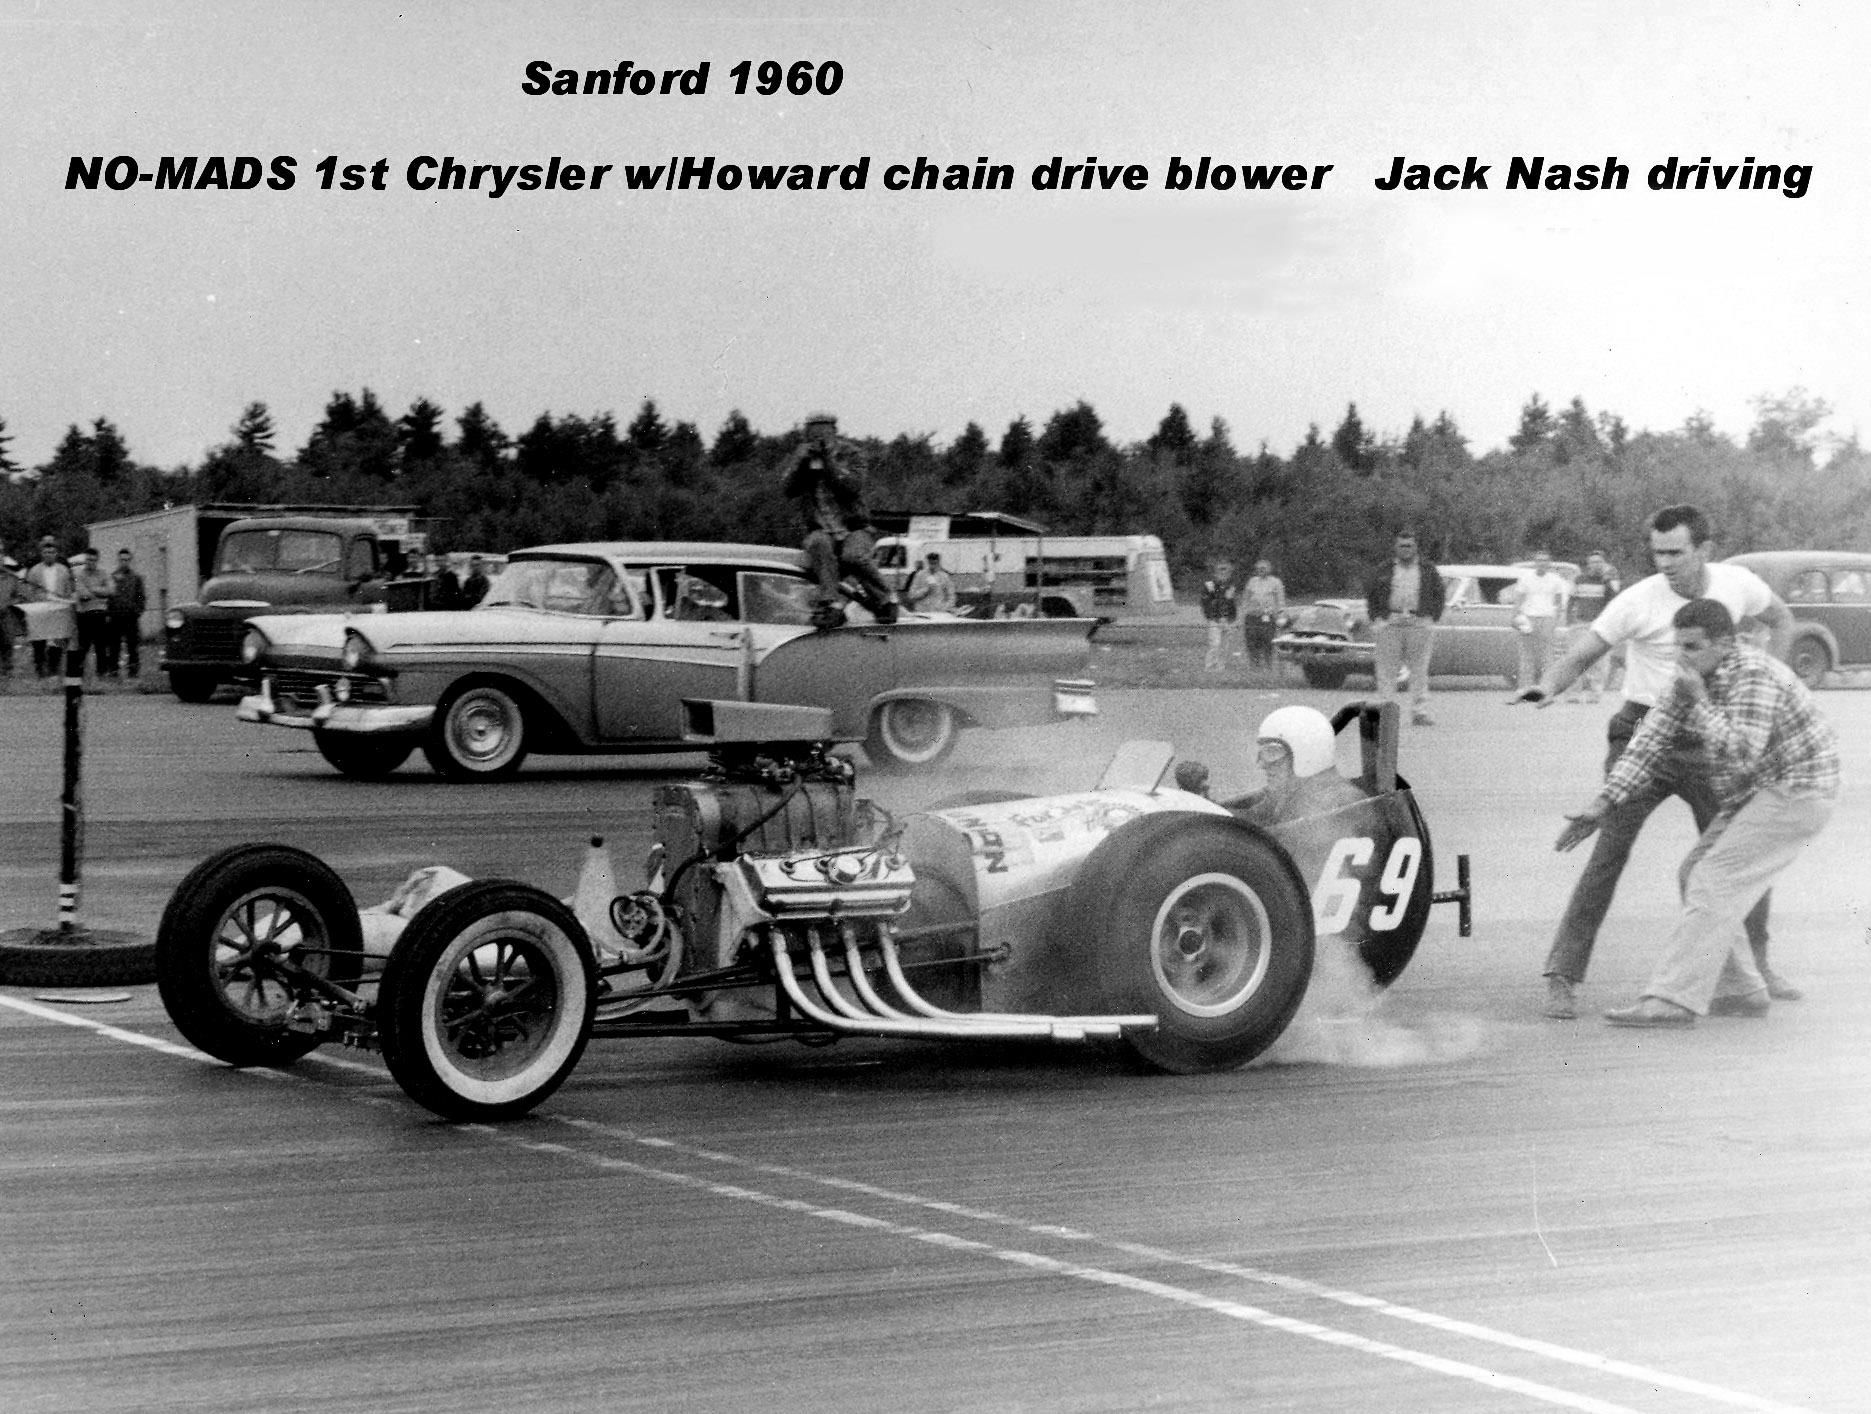 sanford30 | Drag Racing III | Pinterest | Cars, Vintage and Drag cars